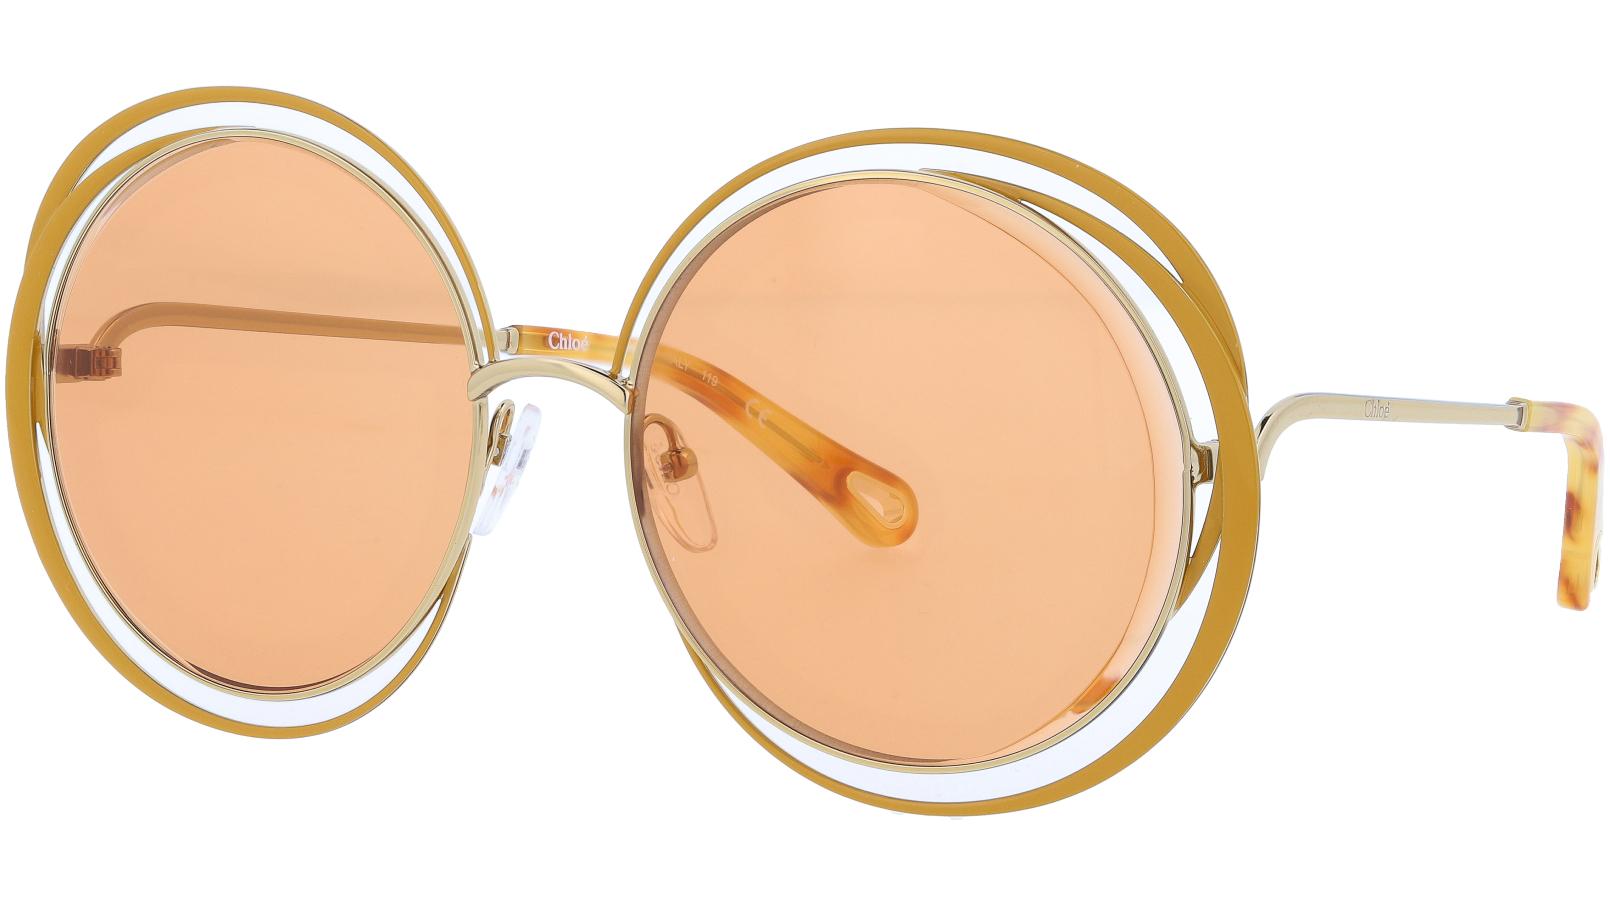 CHLOE CE155S 848 59 Gold Ochre Carlina Round Sunglasses